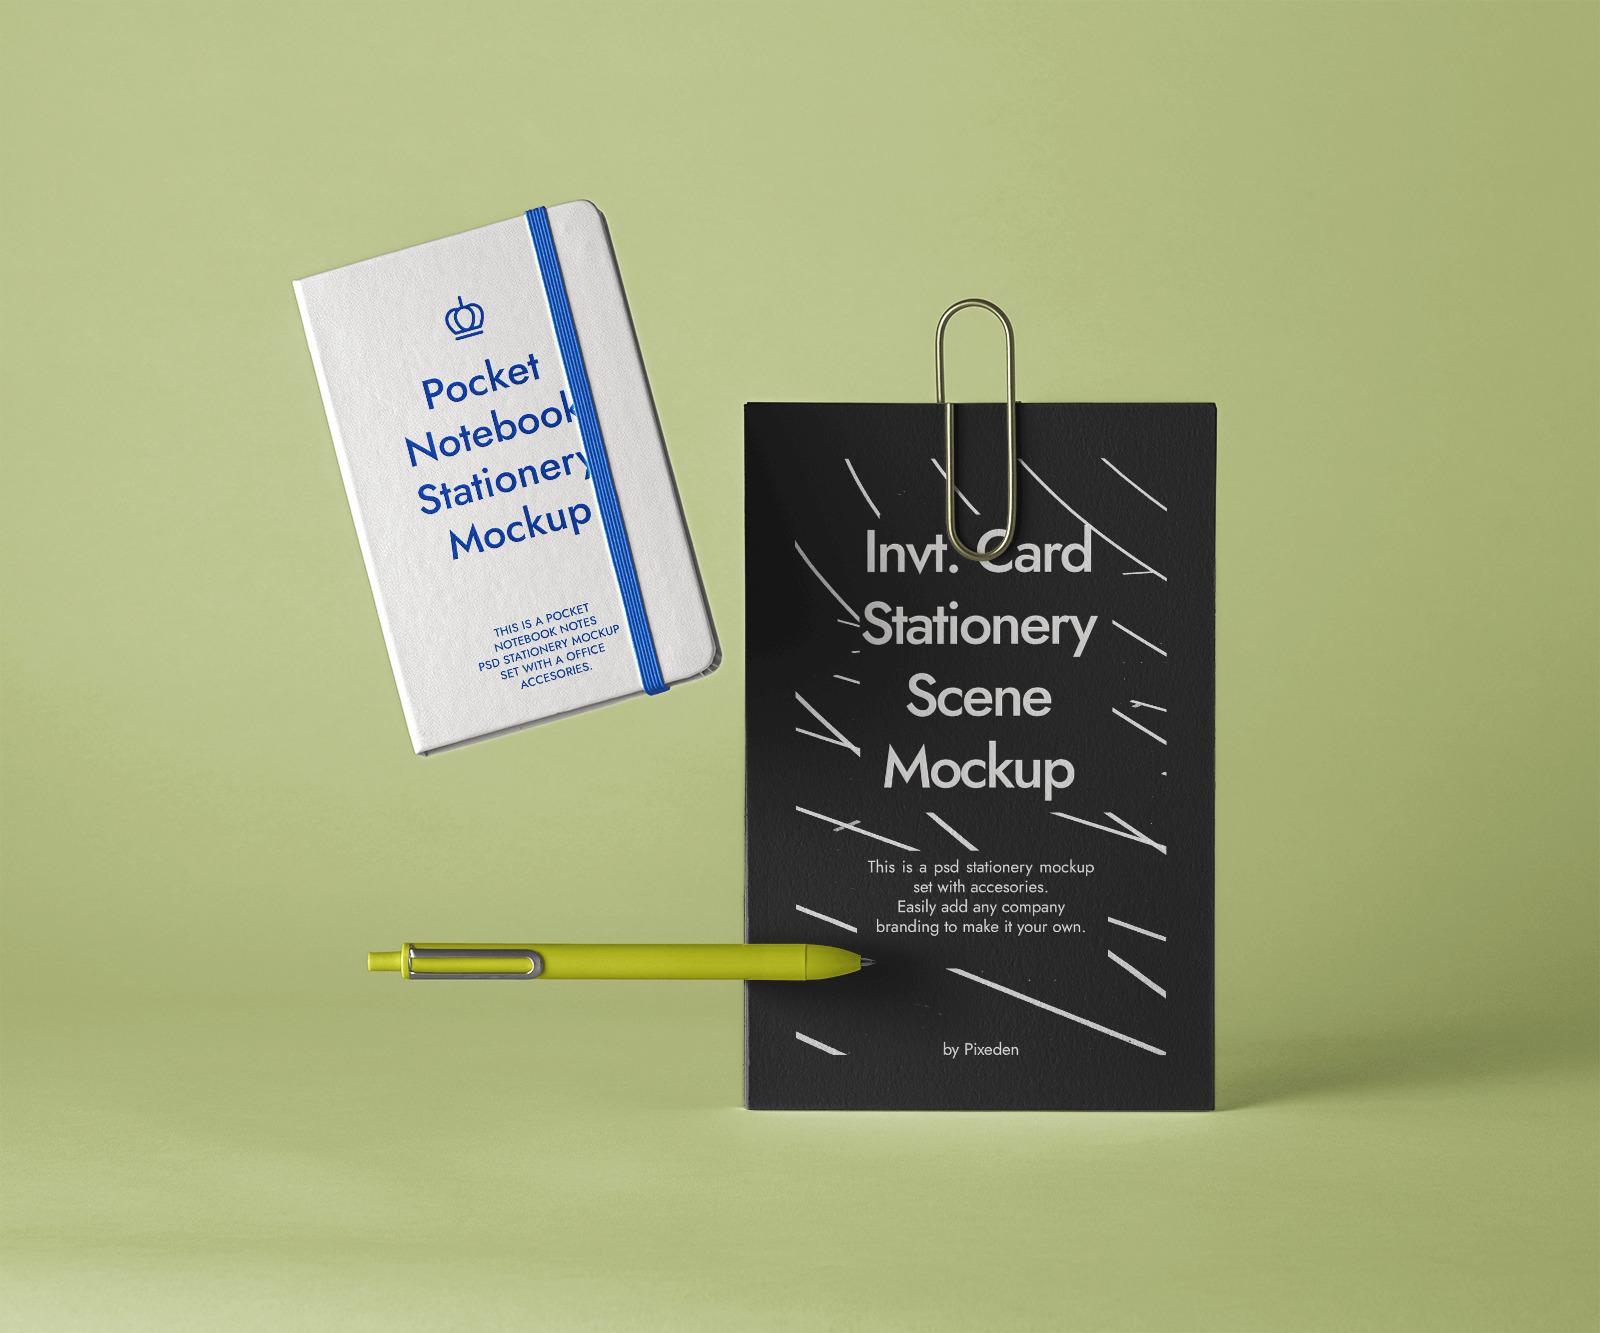 Free Invitation Card and Notebook Mockup